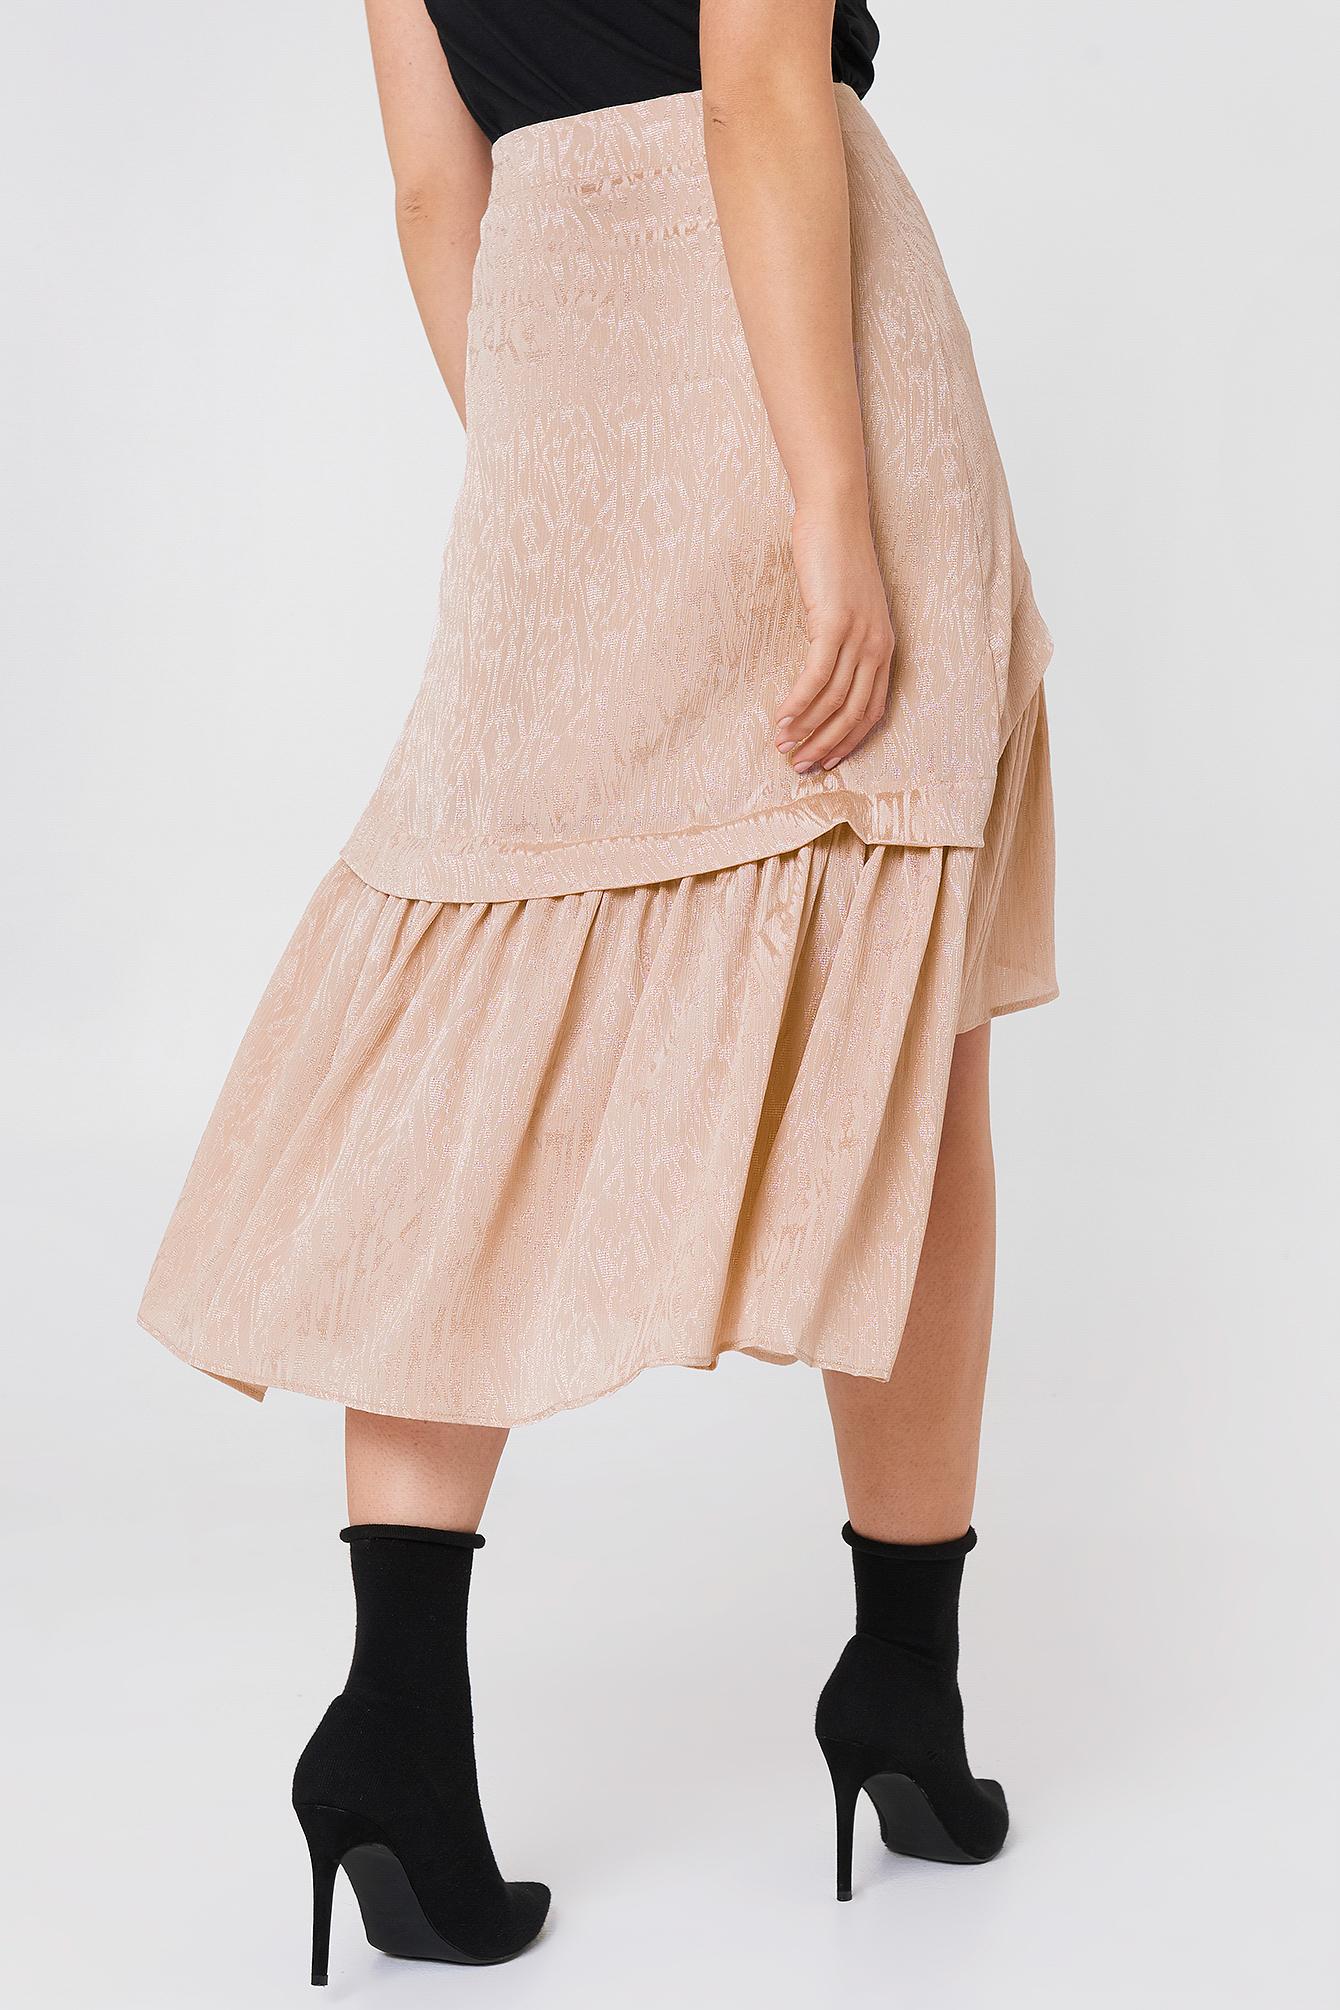 Cete Skirt NA-KD.COM